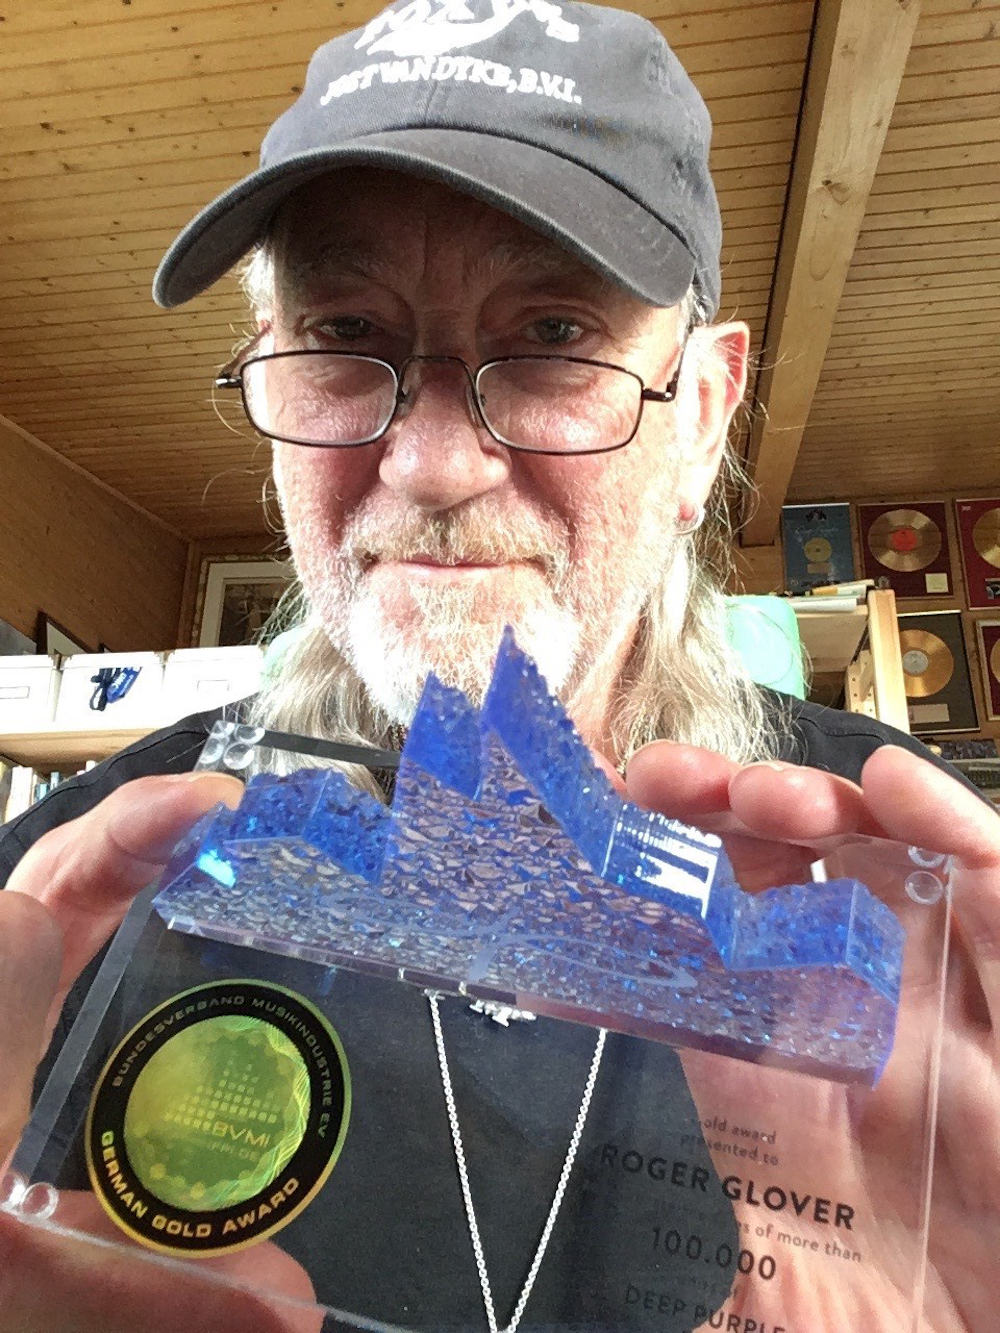 Deep-Purple-Roger-Glover-inFinite-Gold-Award-2020-Photo-Credit-Roger-Glover-1000px